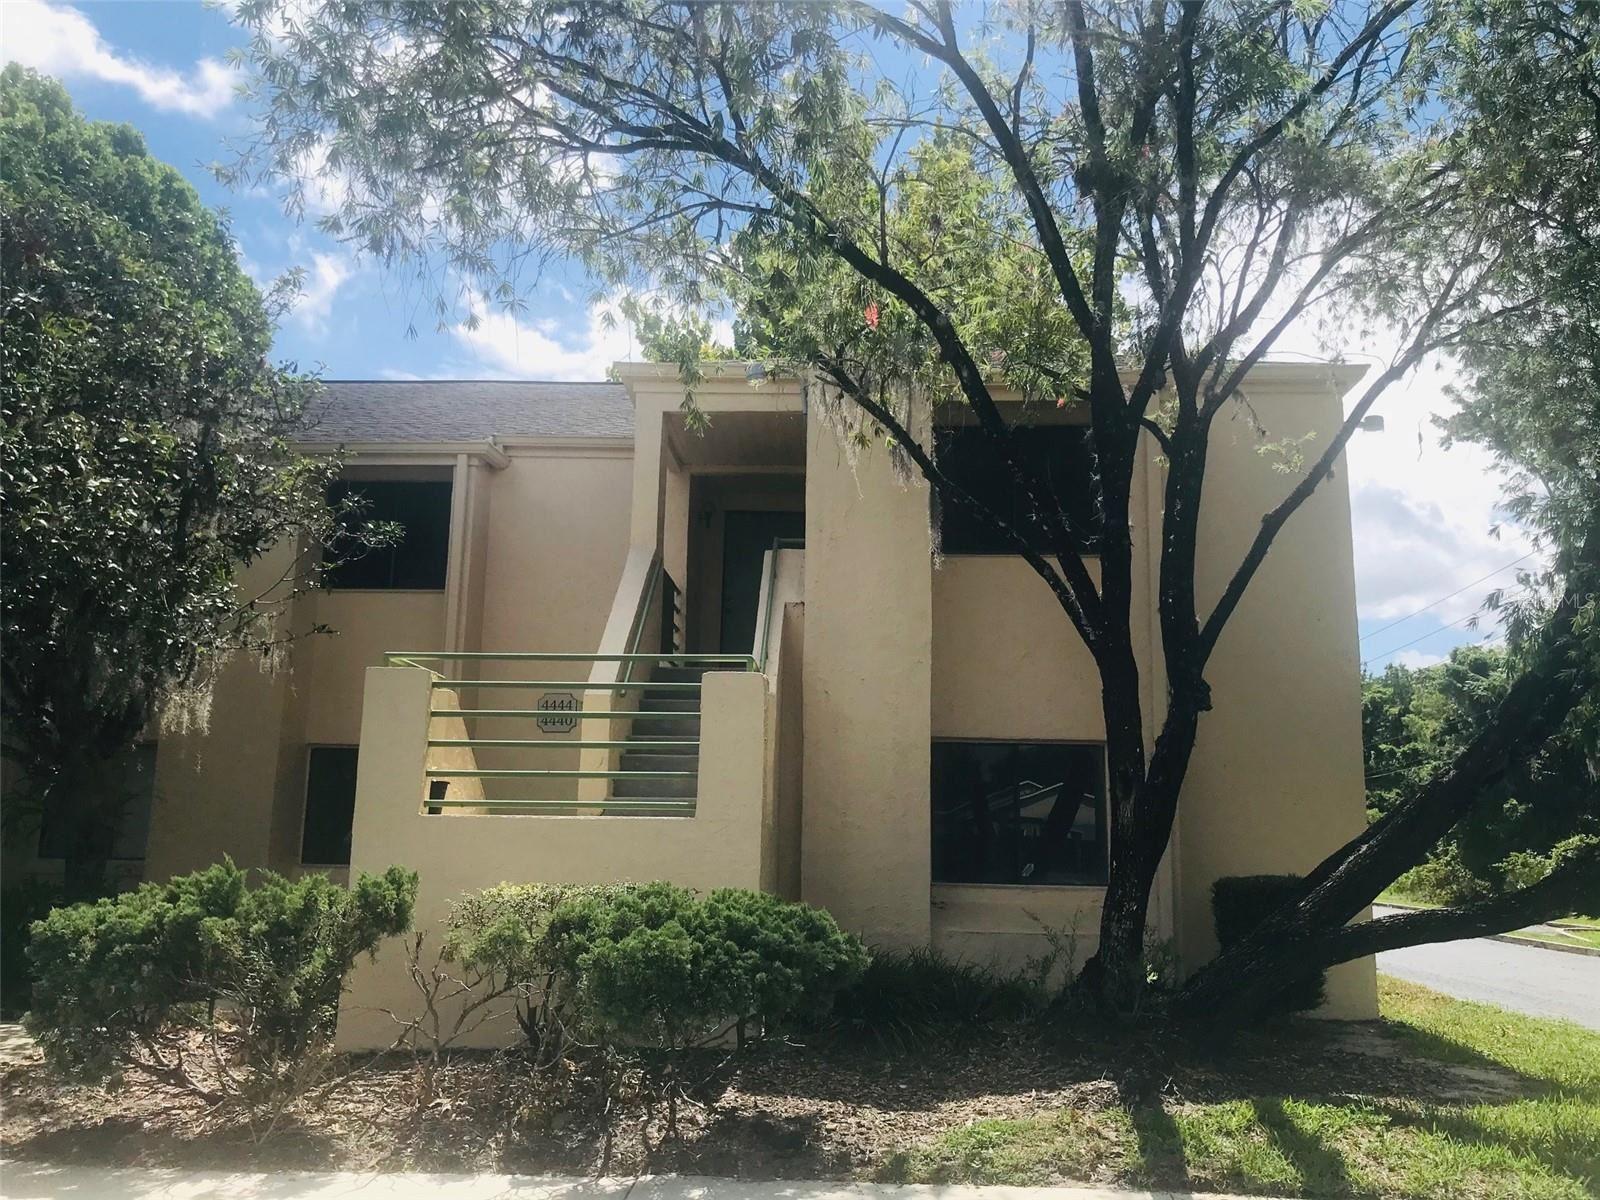 4440 S LAKE ORLANDO PARKWAY #4, Orlando, FL 32808 - MLS#: S5051891